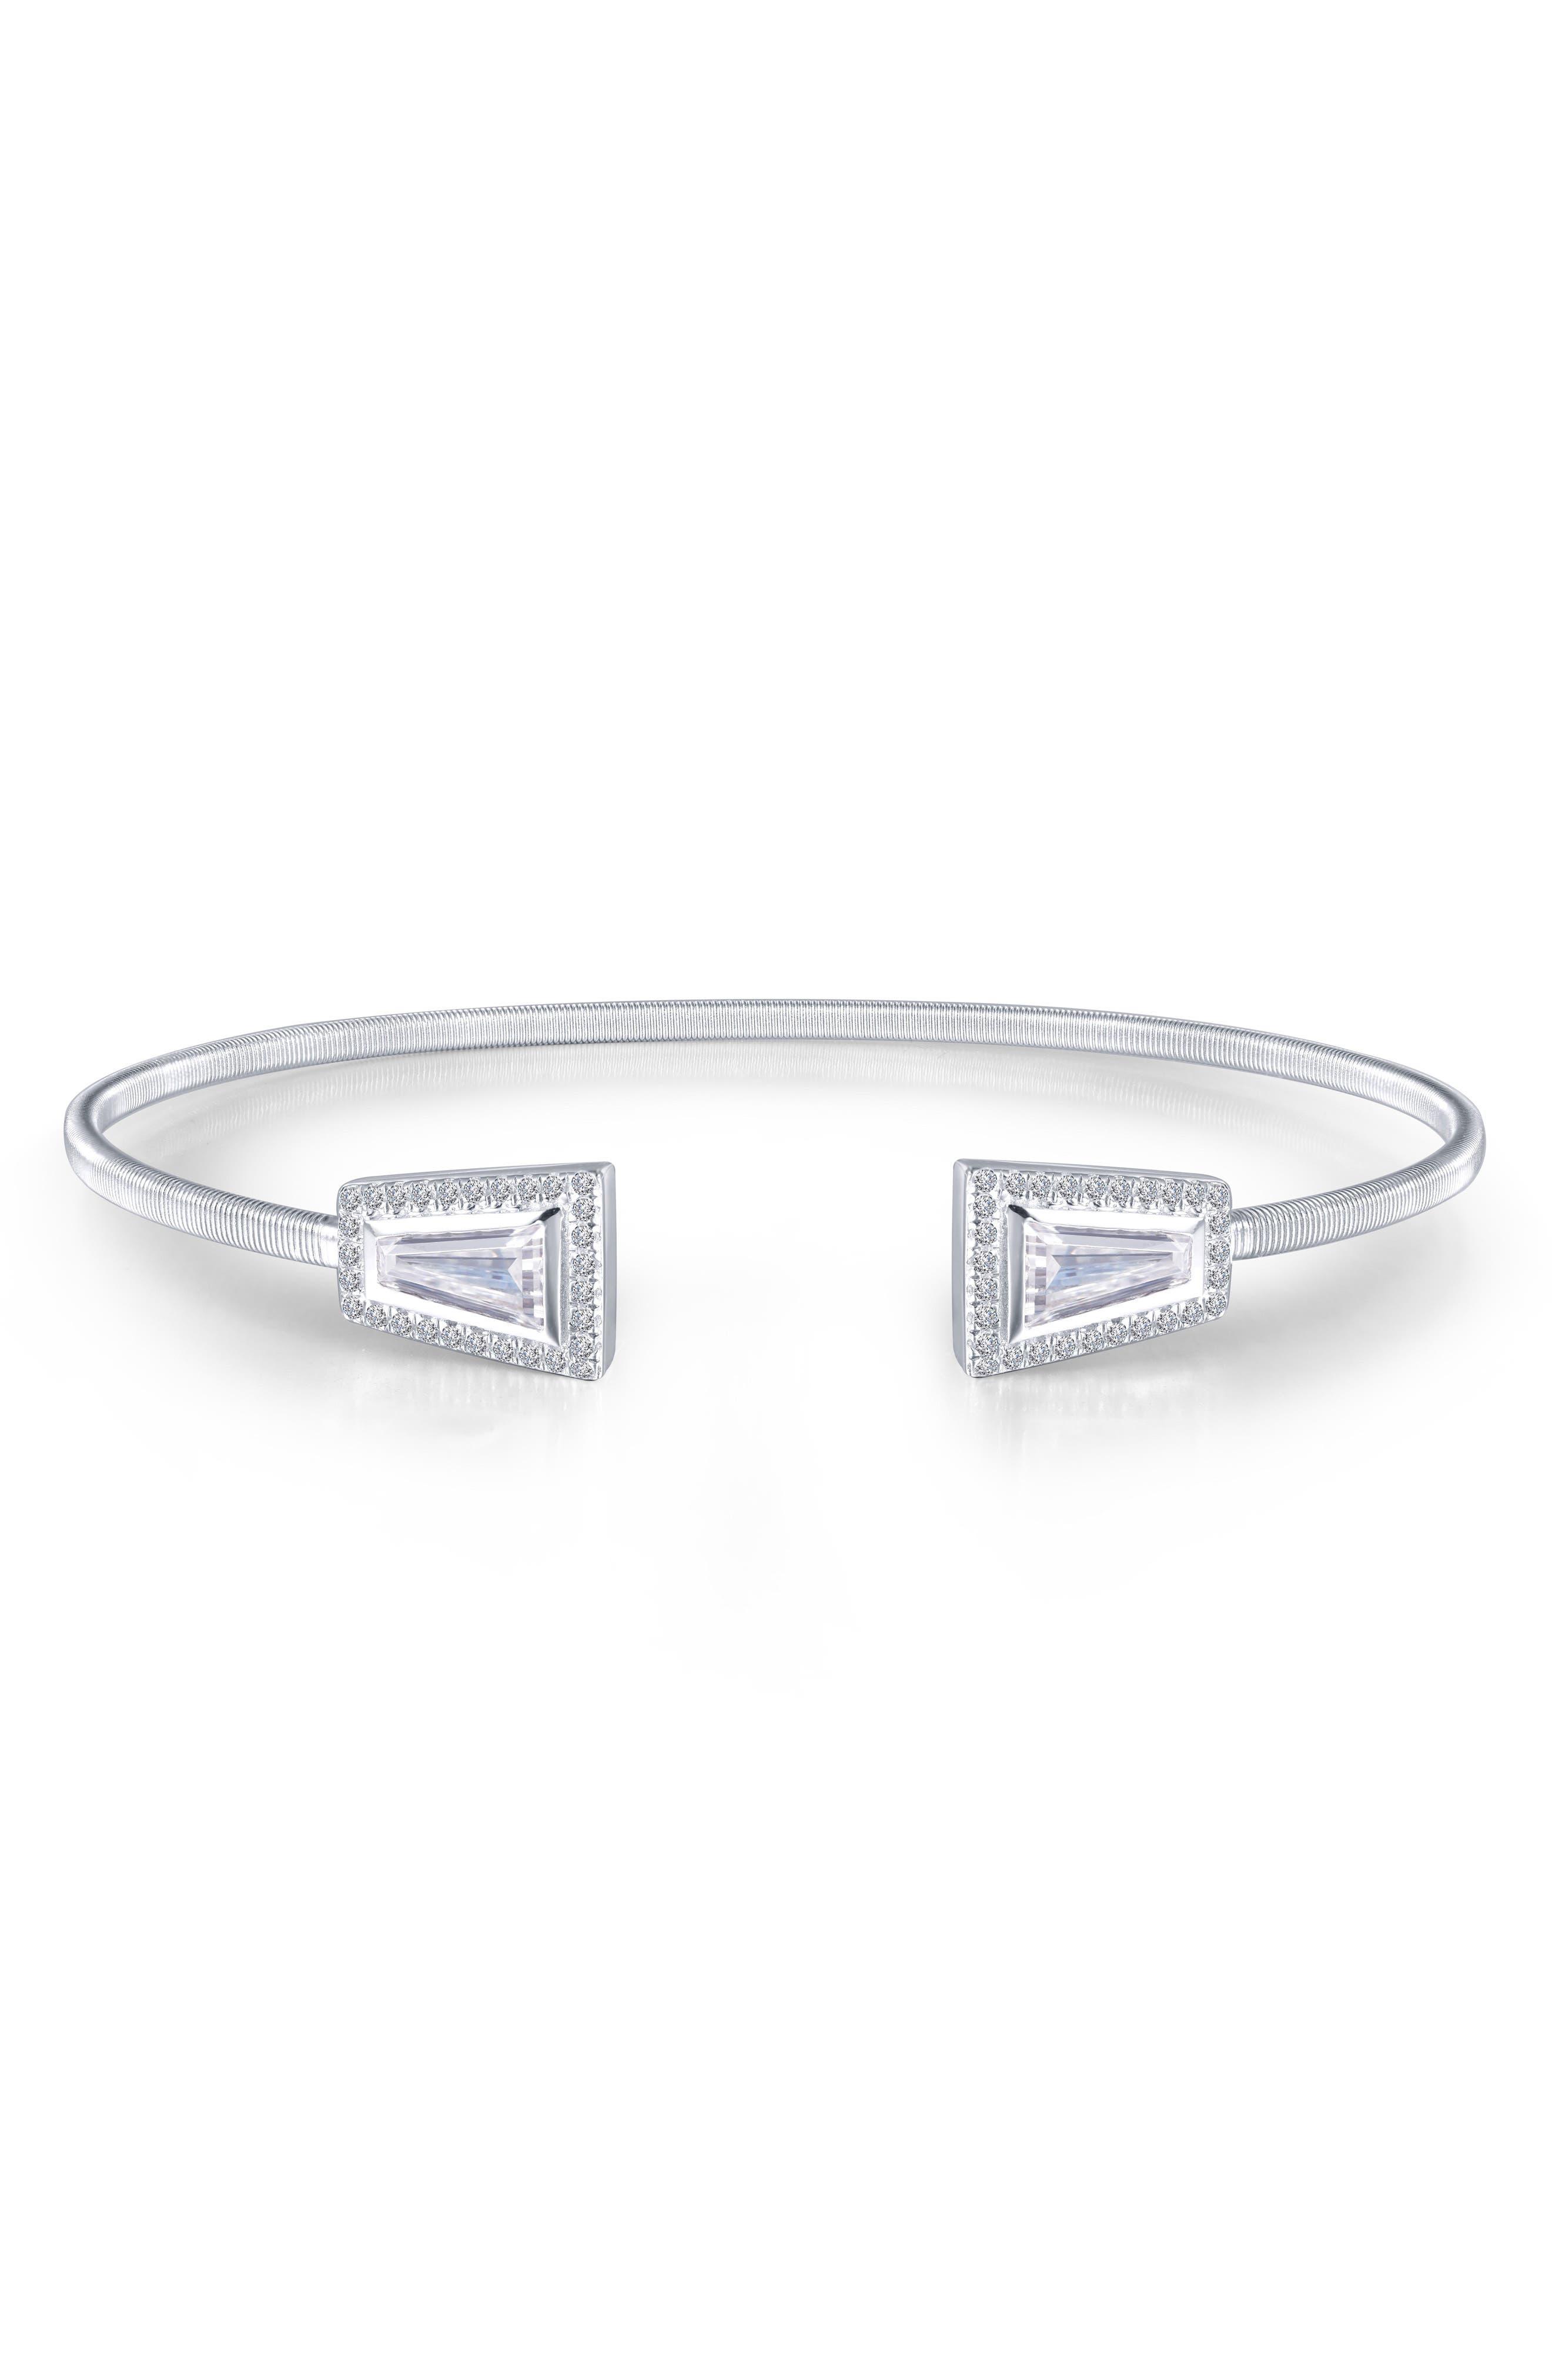 Bezel Cuff Bracelet,                             Alternate thumbnail 2, color,                             SILVER/ CLEAR